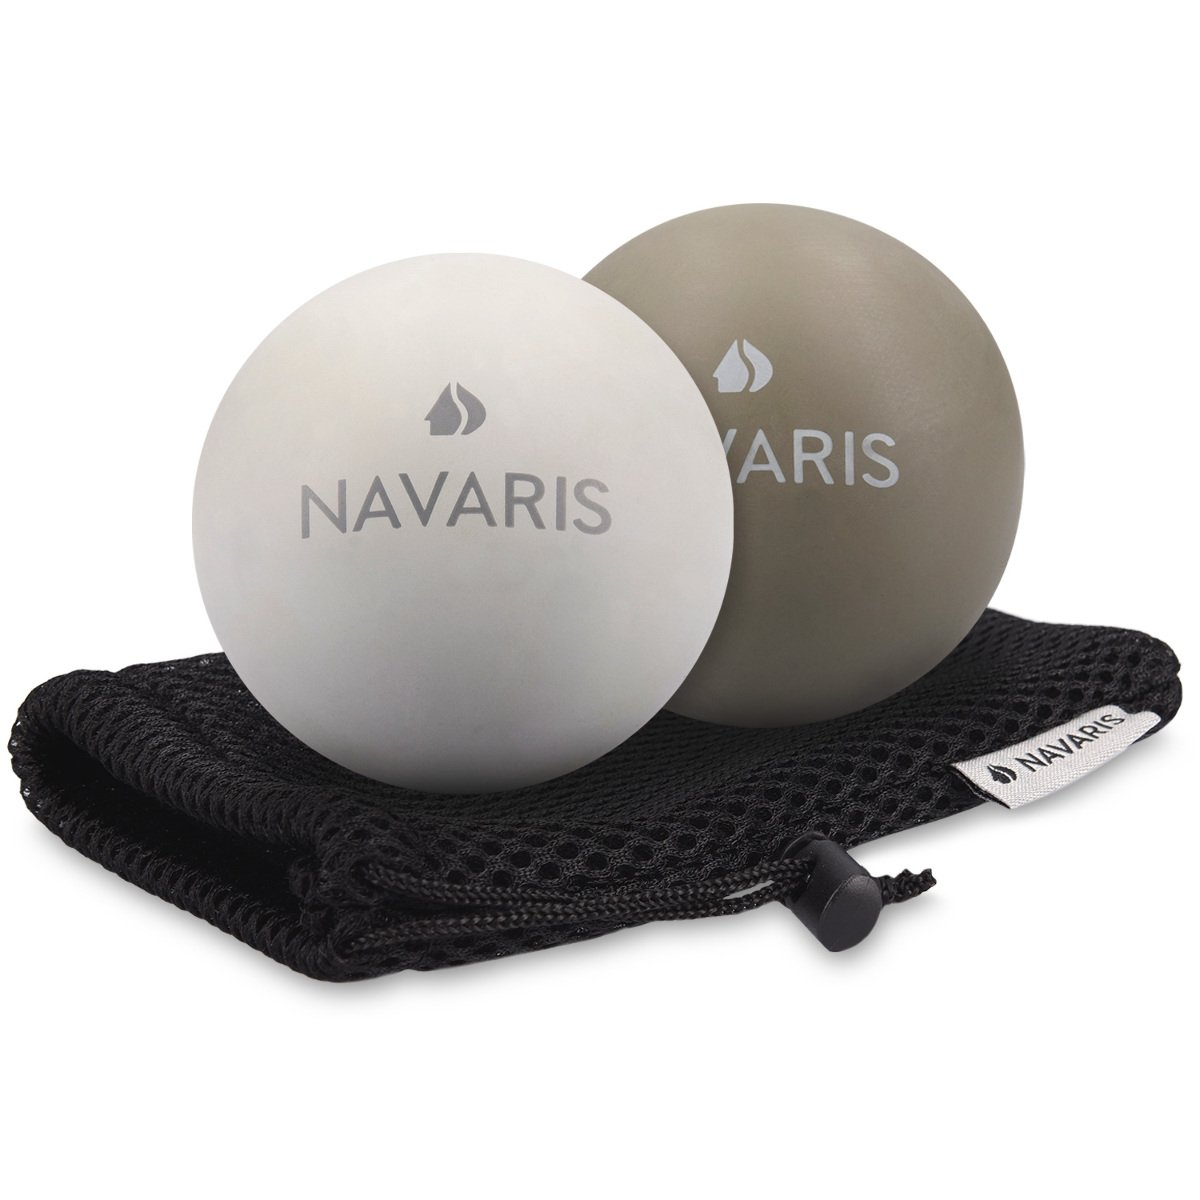 Selbstmassage Gummi Faszienball Lacrosse Ball Trigger Point Navaris Massageball 2er Set Faszien Massage Fu/ß Roller Triggerpunkte